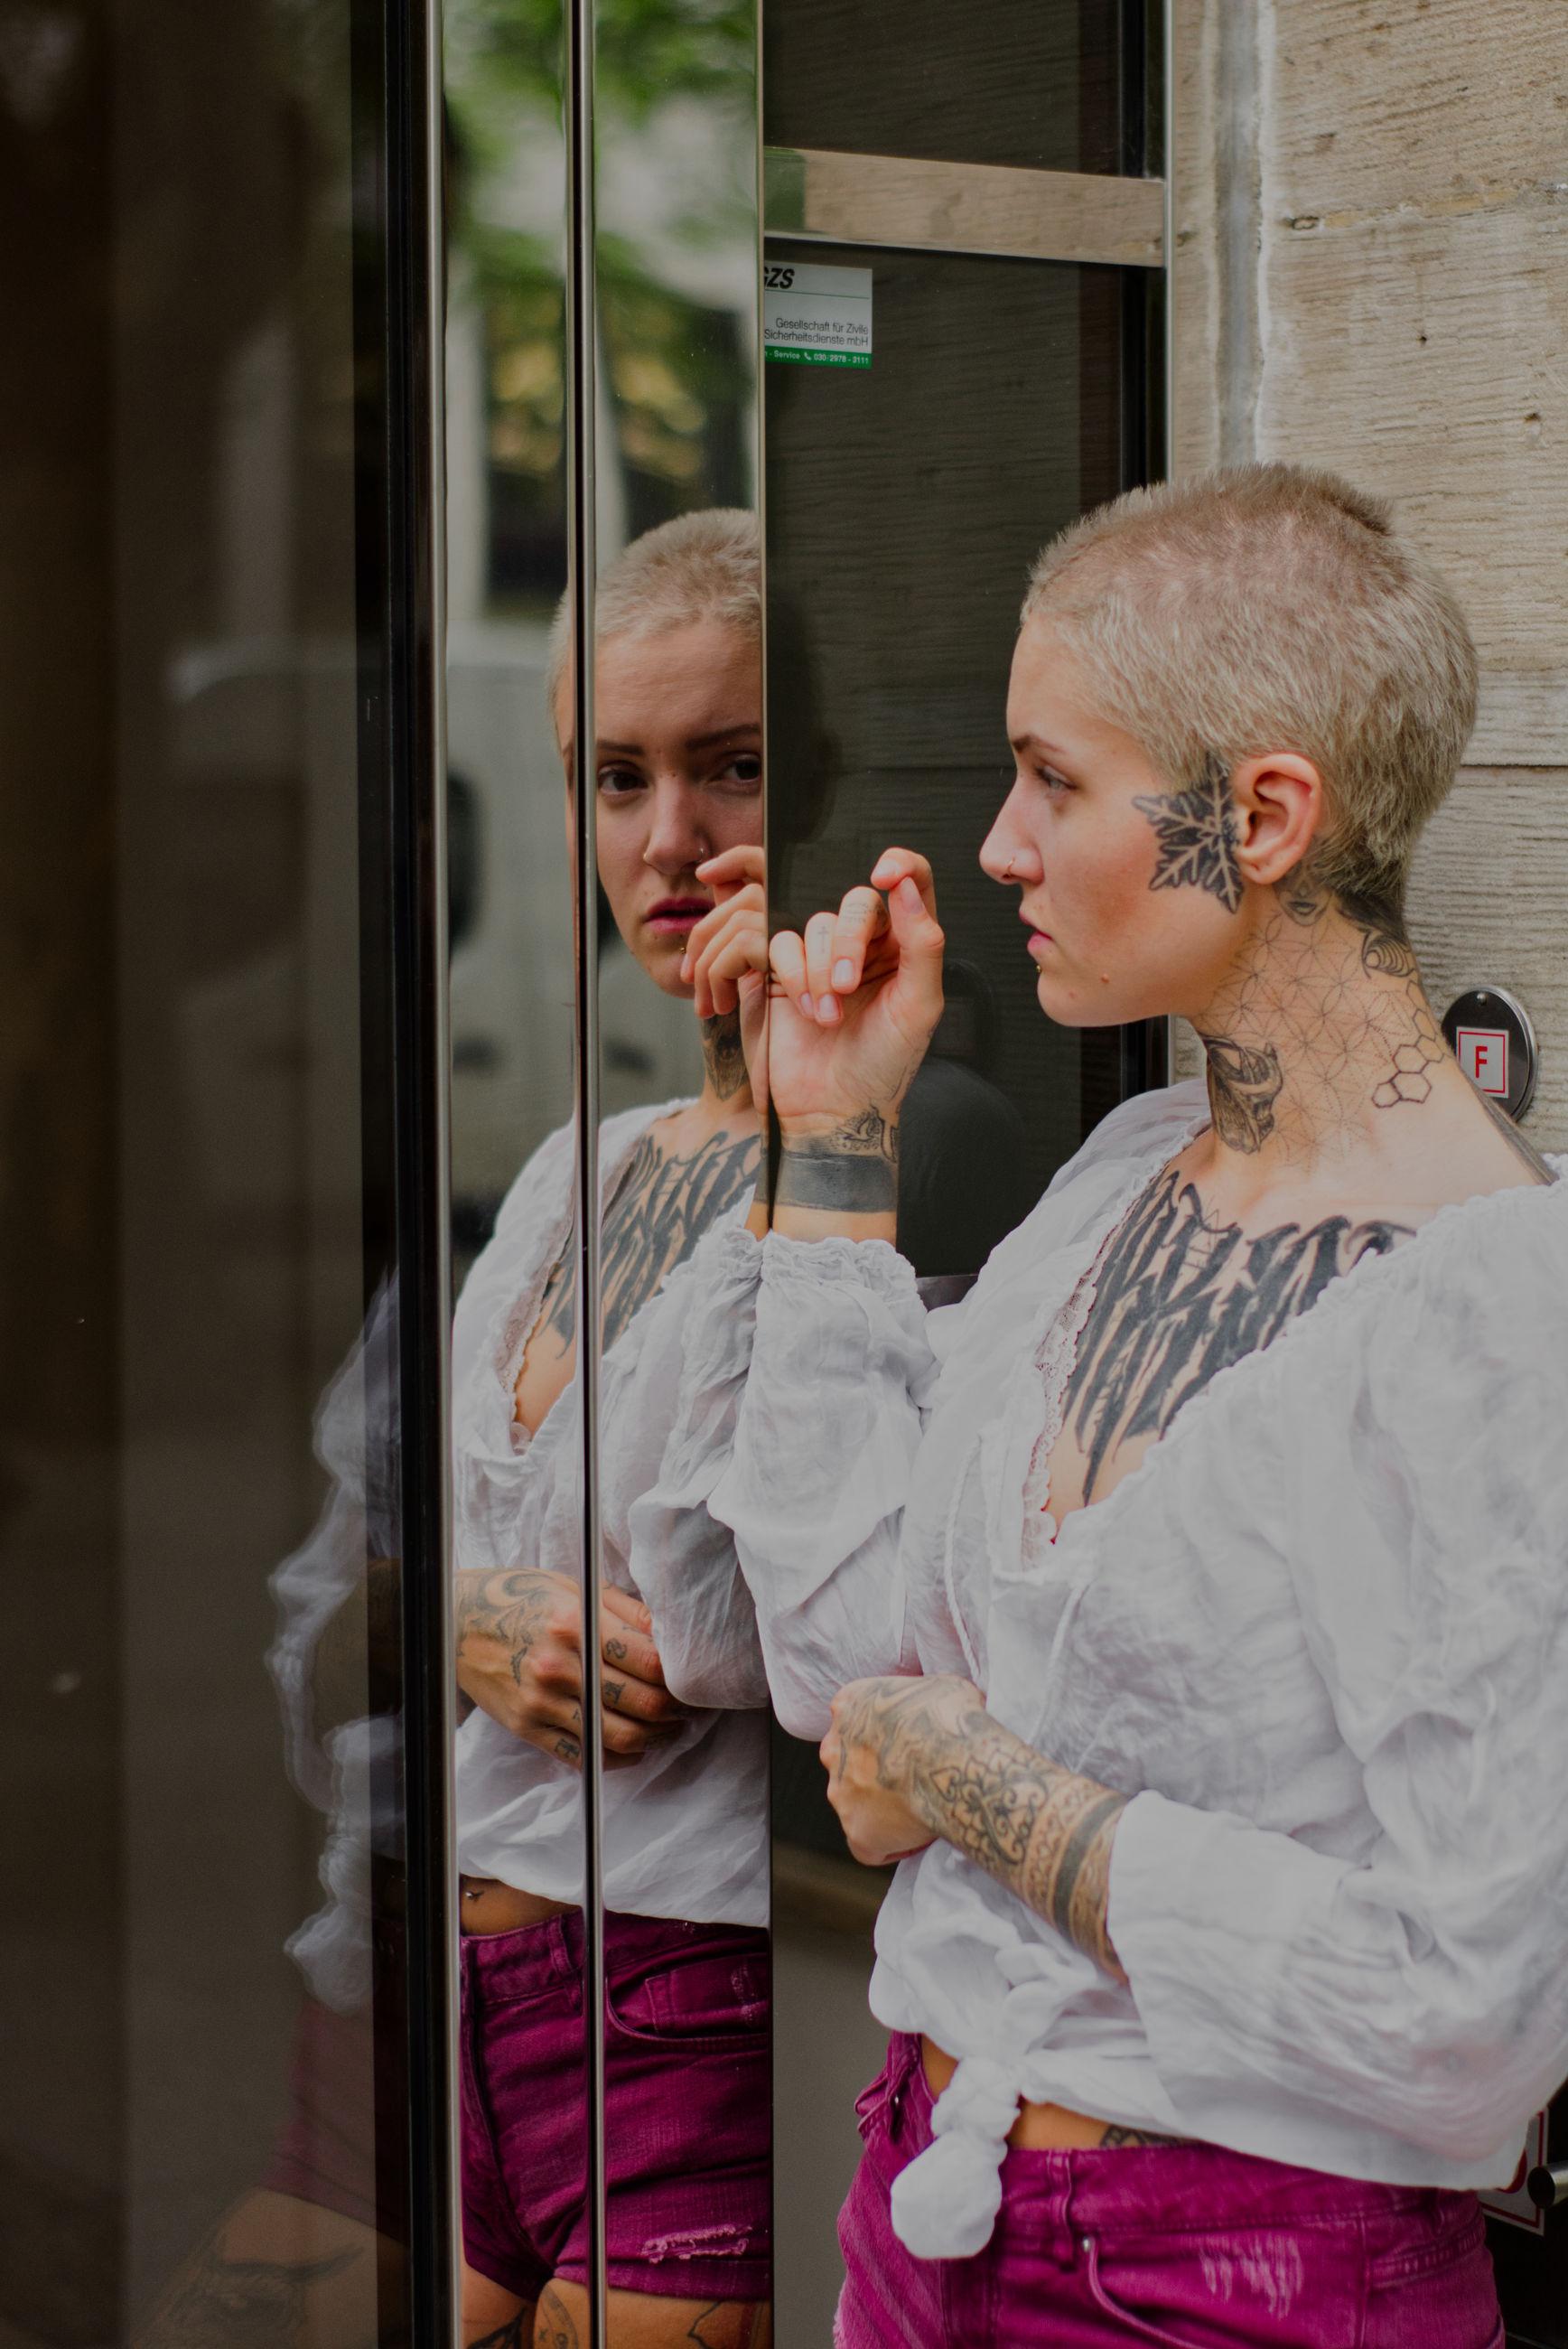 Portrait of tattooed woman reflecting on glass